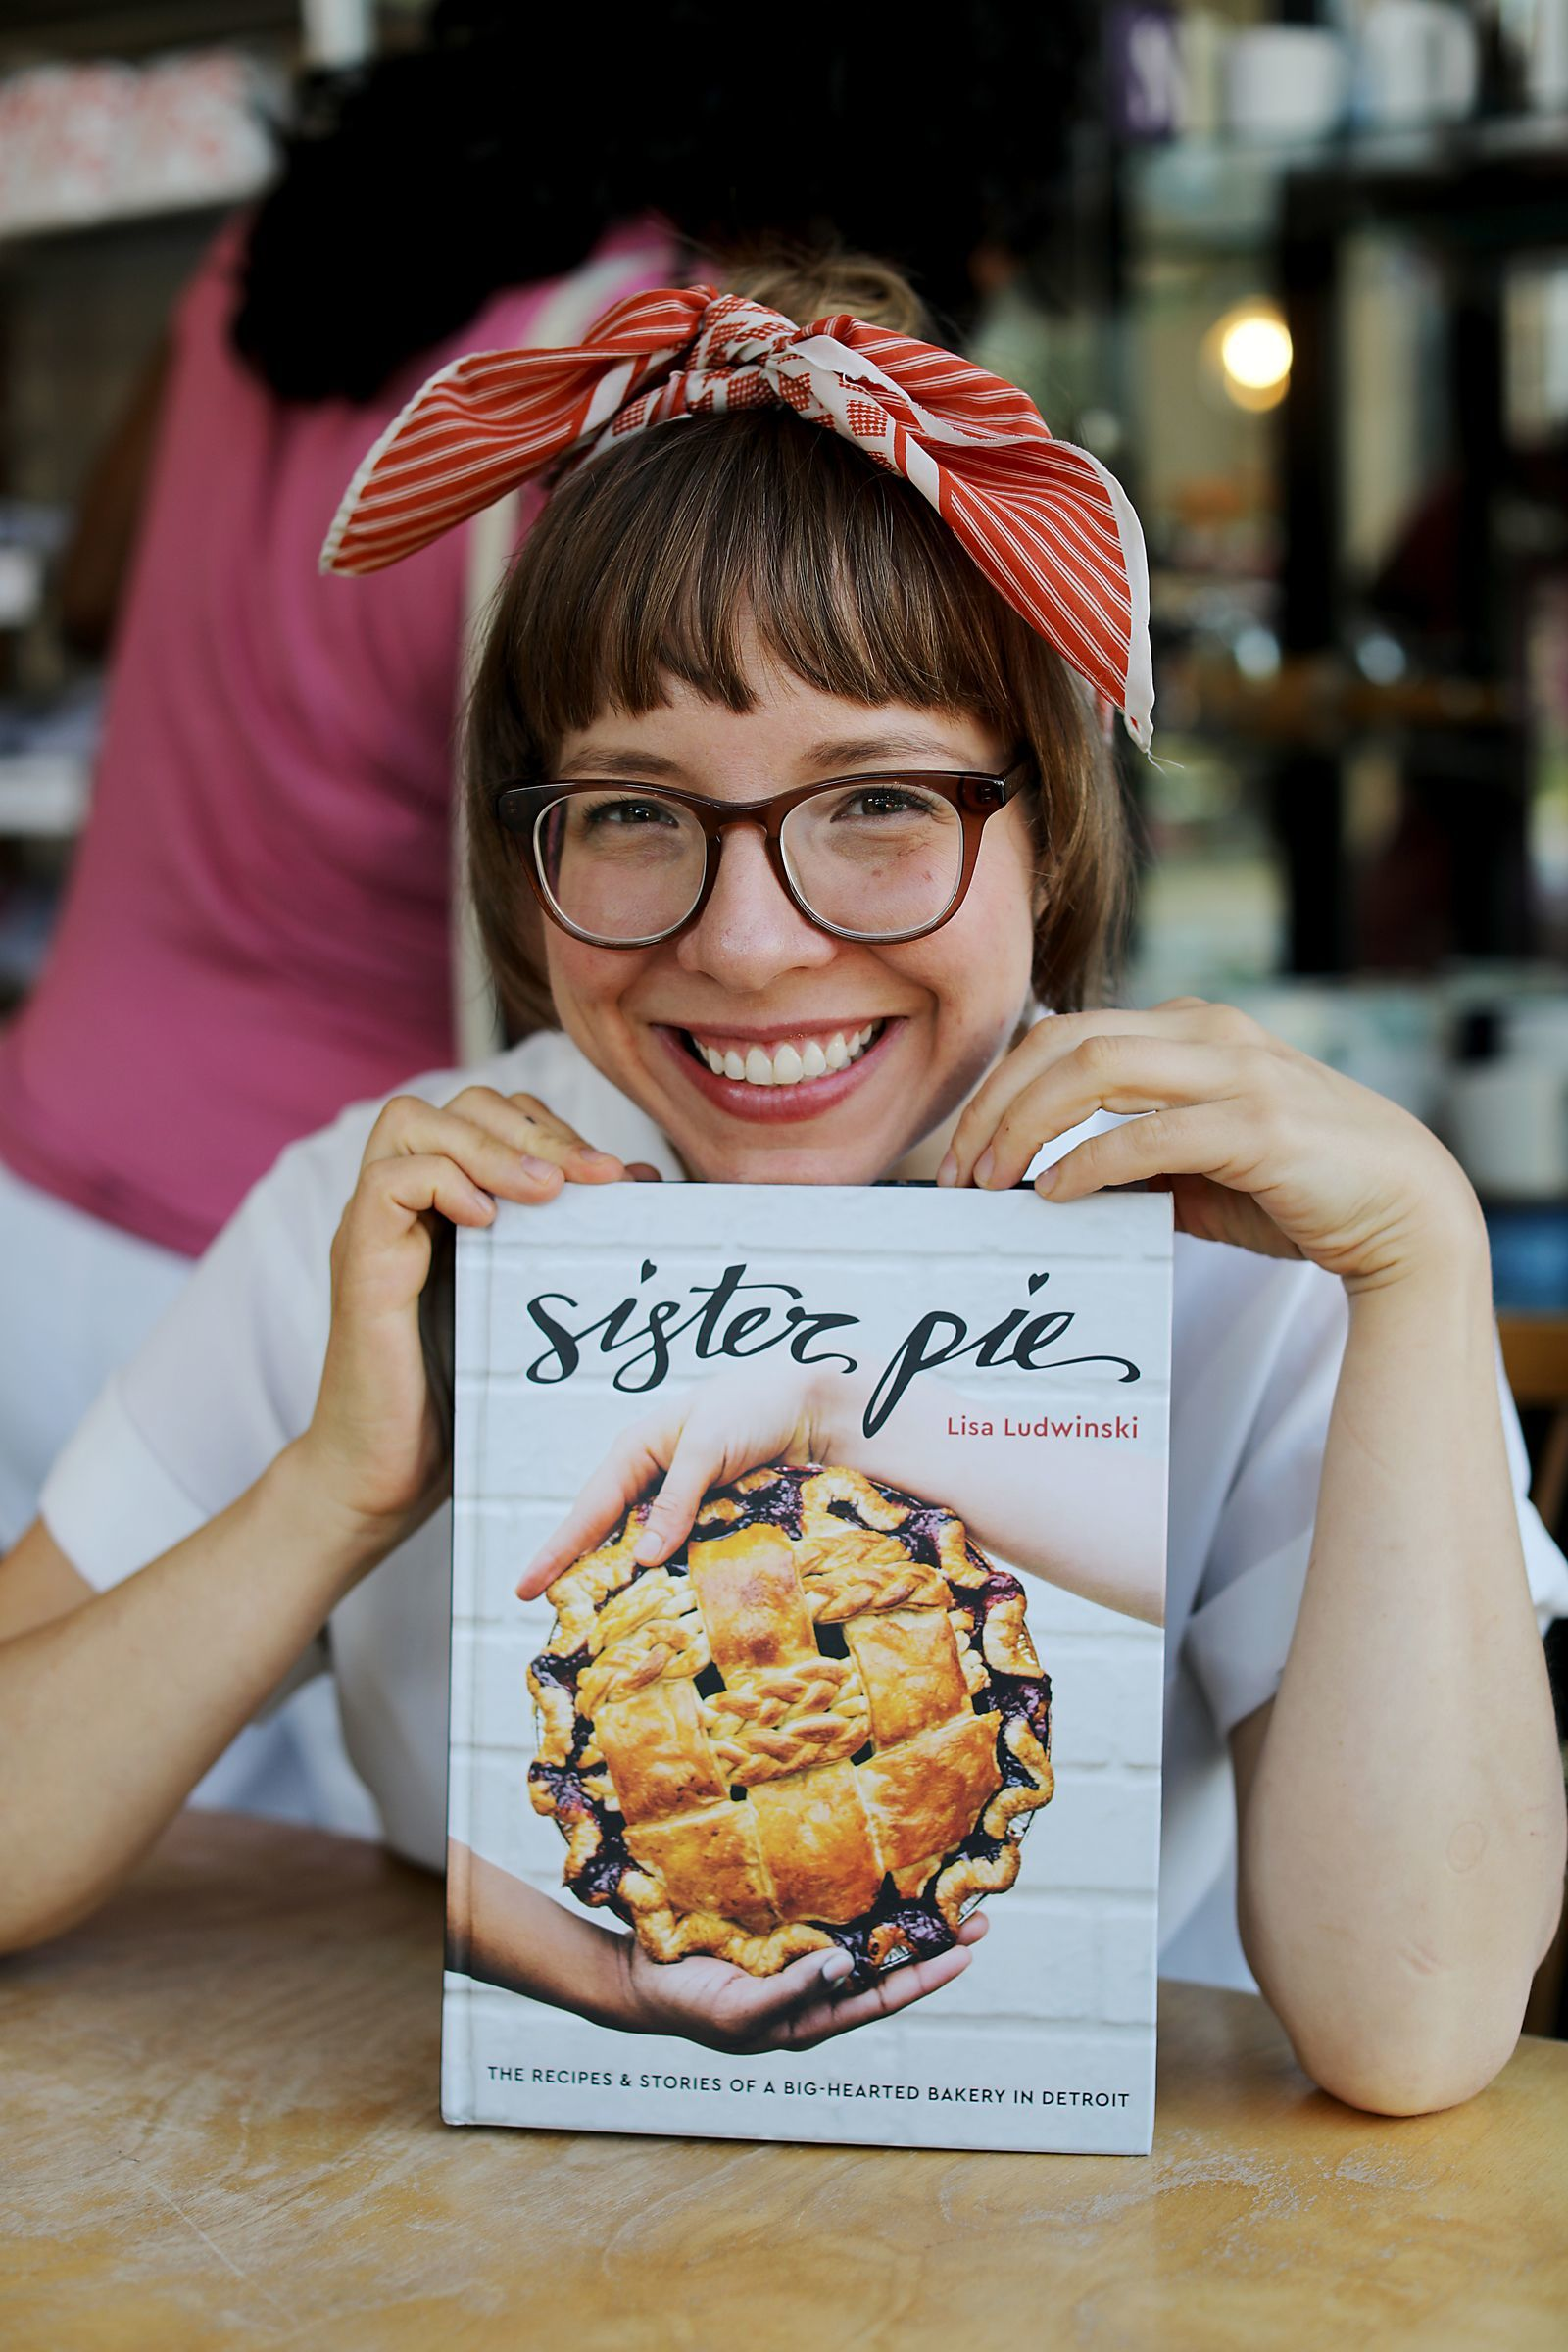 Lisa Ludwinski, 34, of Detroit is the owner of Sister Pie bakery in the West Village neighborhood of Detroit.